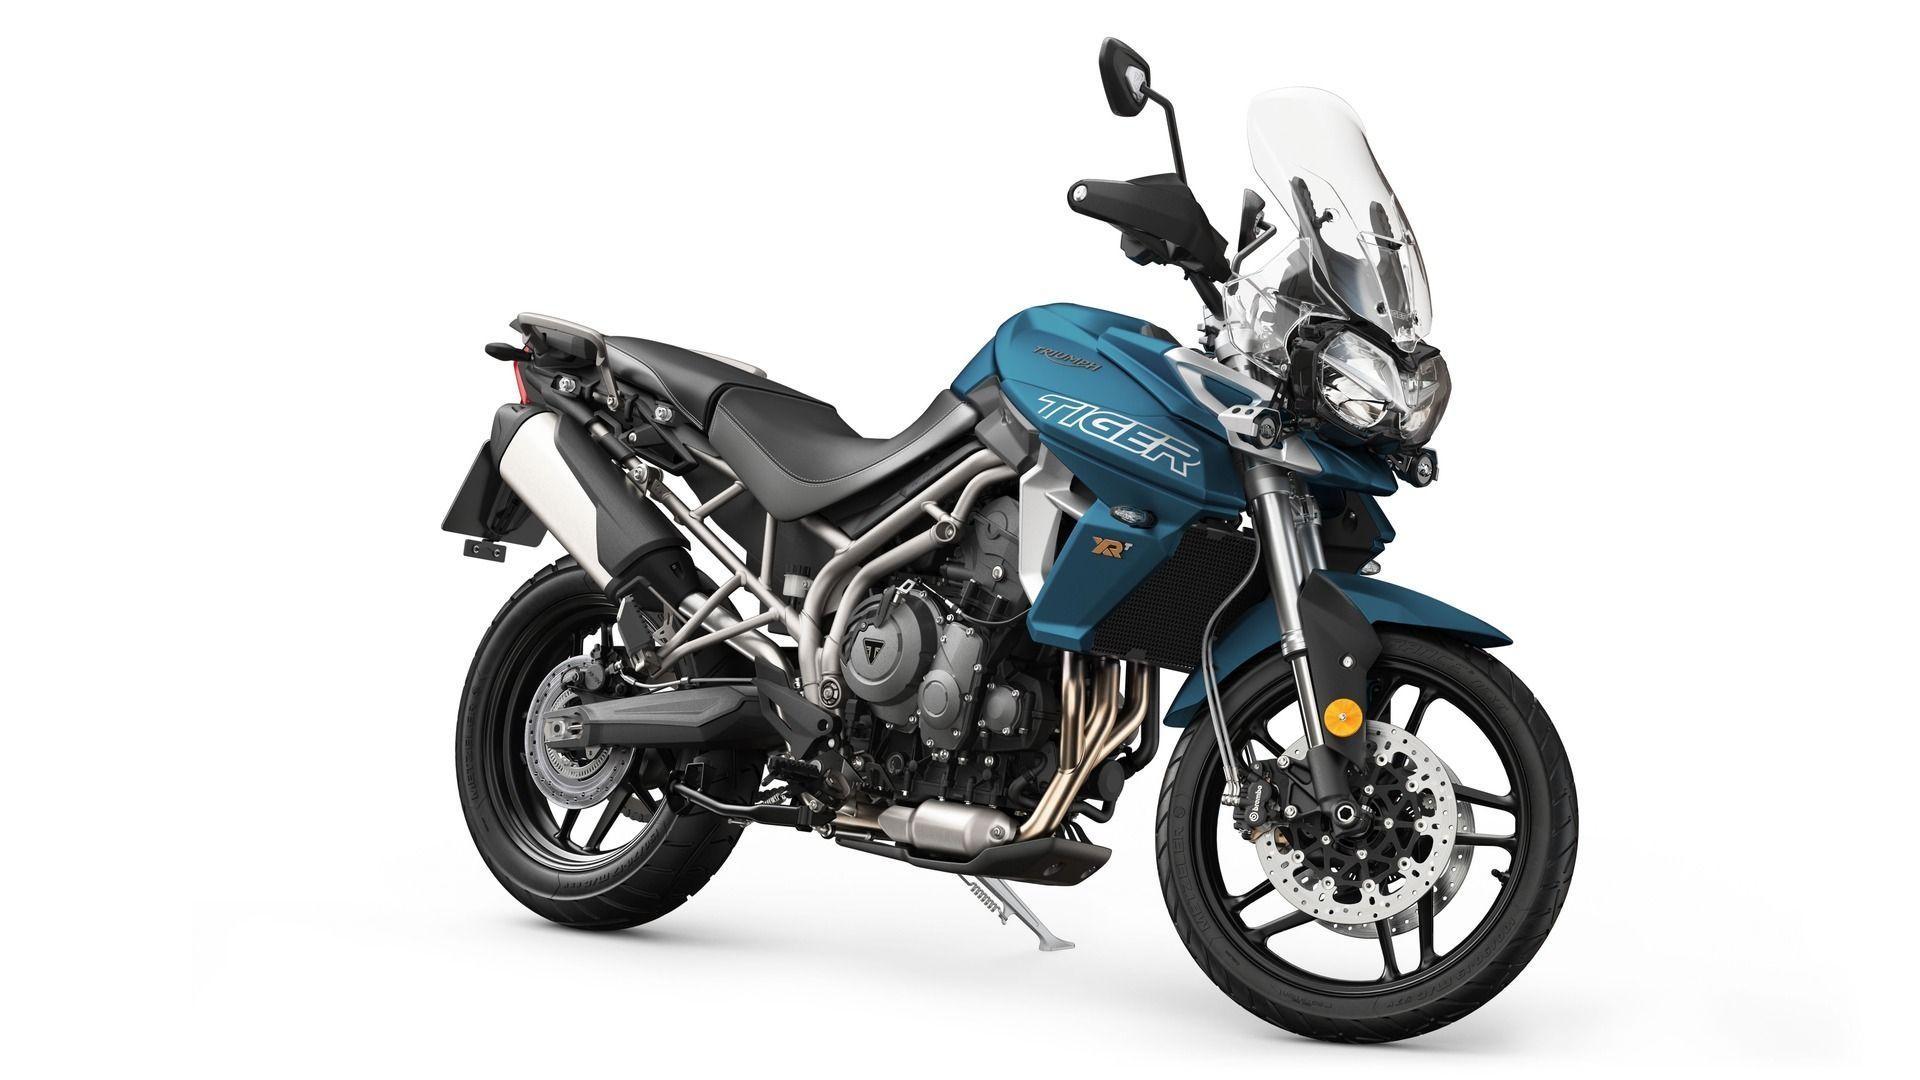 moto neuve acheter triumph tiger 800 xrt modell 2018 st dler motos ag widnau. Black Bedroom Furniture Sets. Home Design Ideas